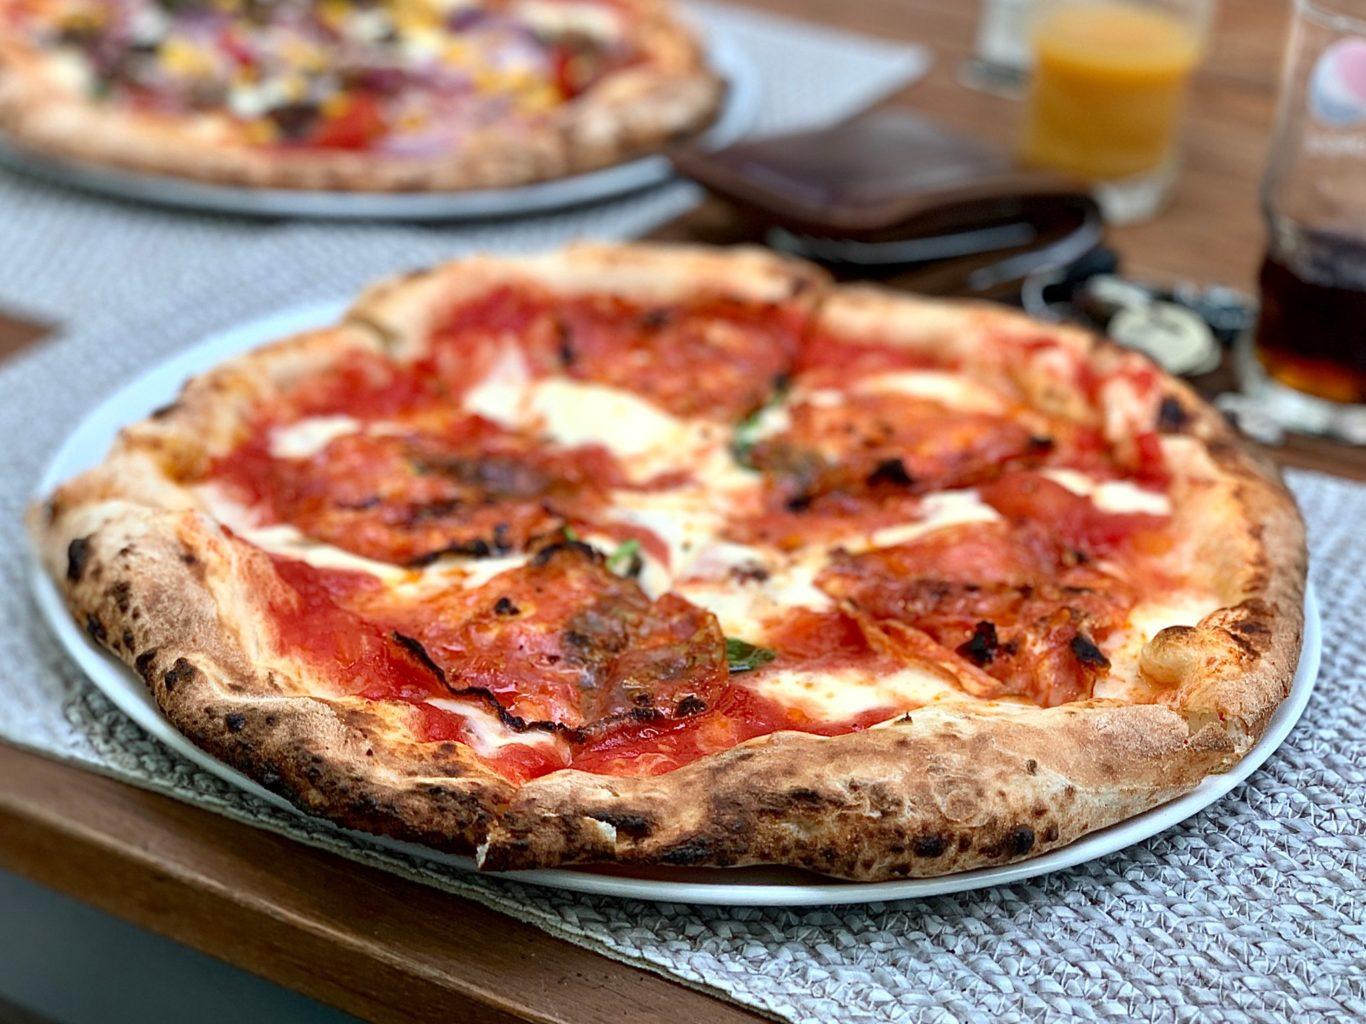 pizza ru blat rumen si crocant, mozzarella si sos de rosii, pe farfurie alba si stergar gri, pizza italiană București